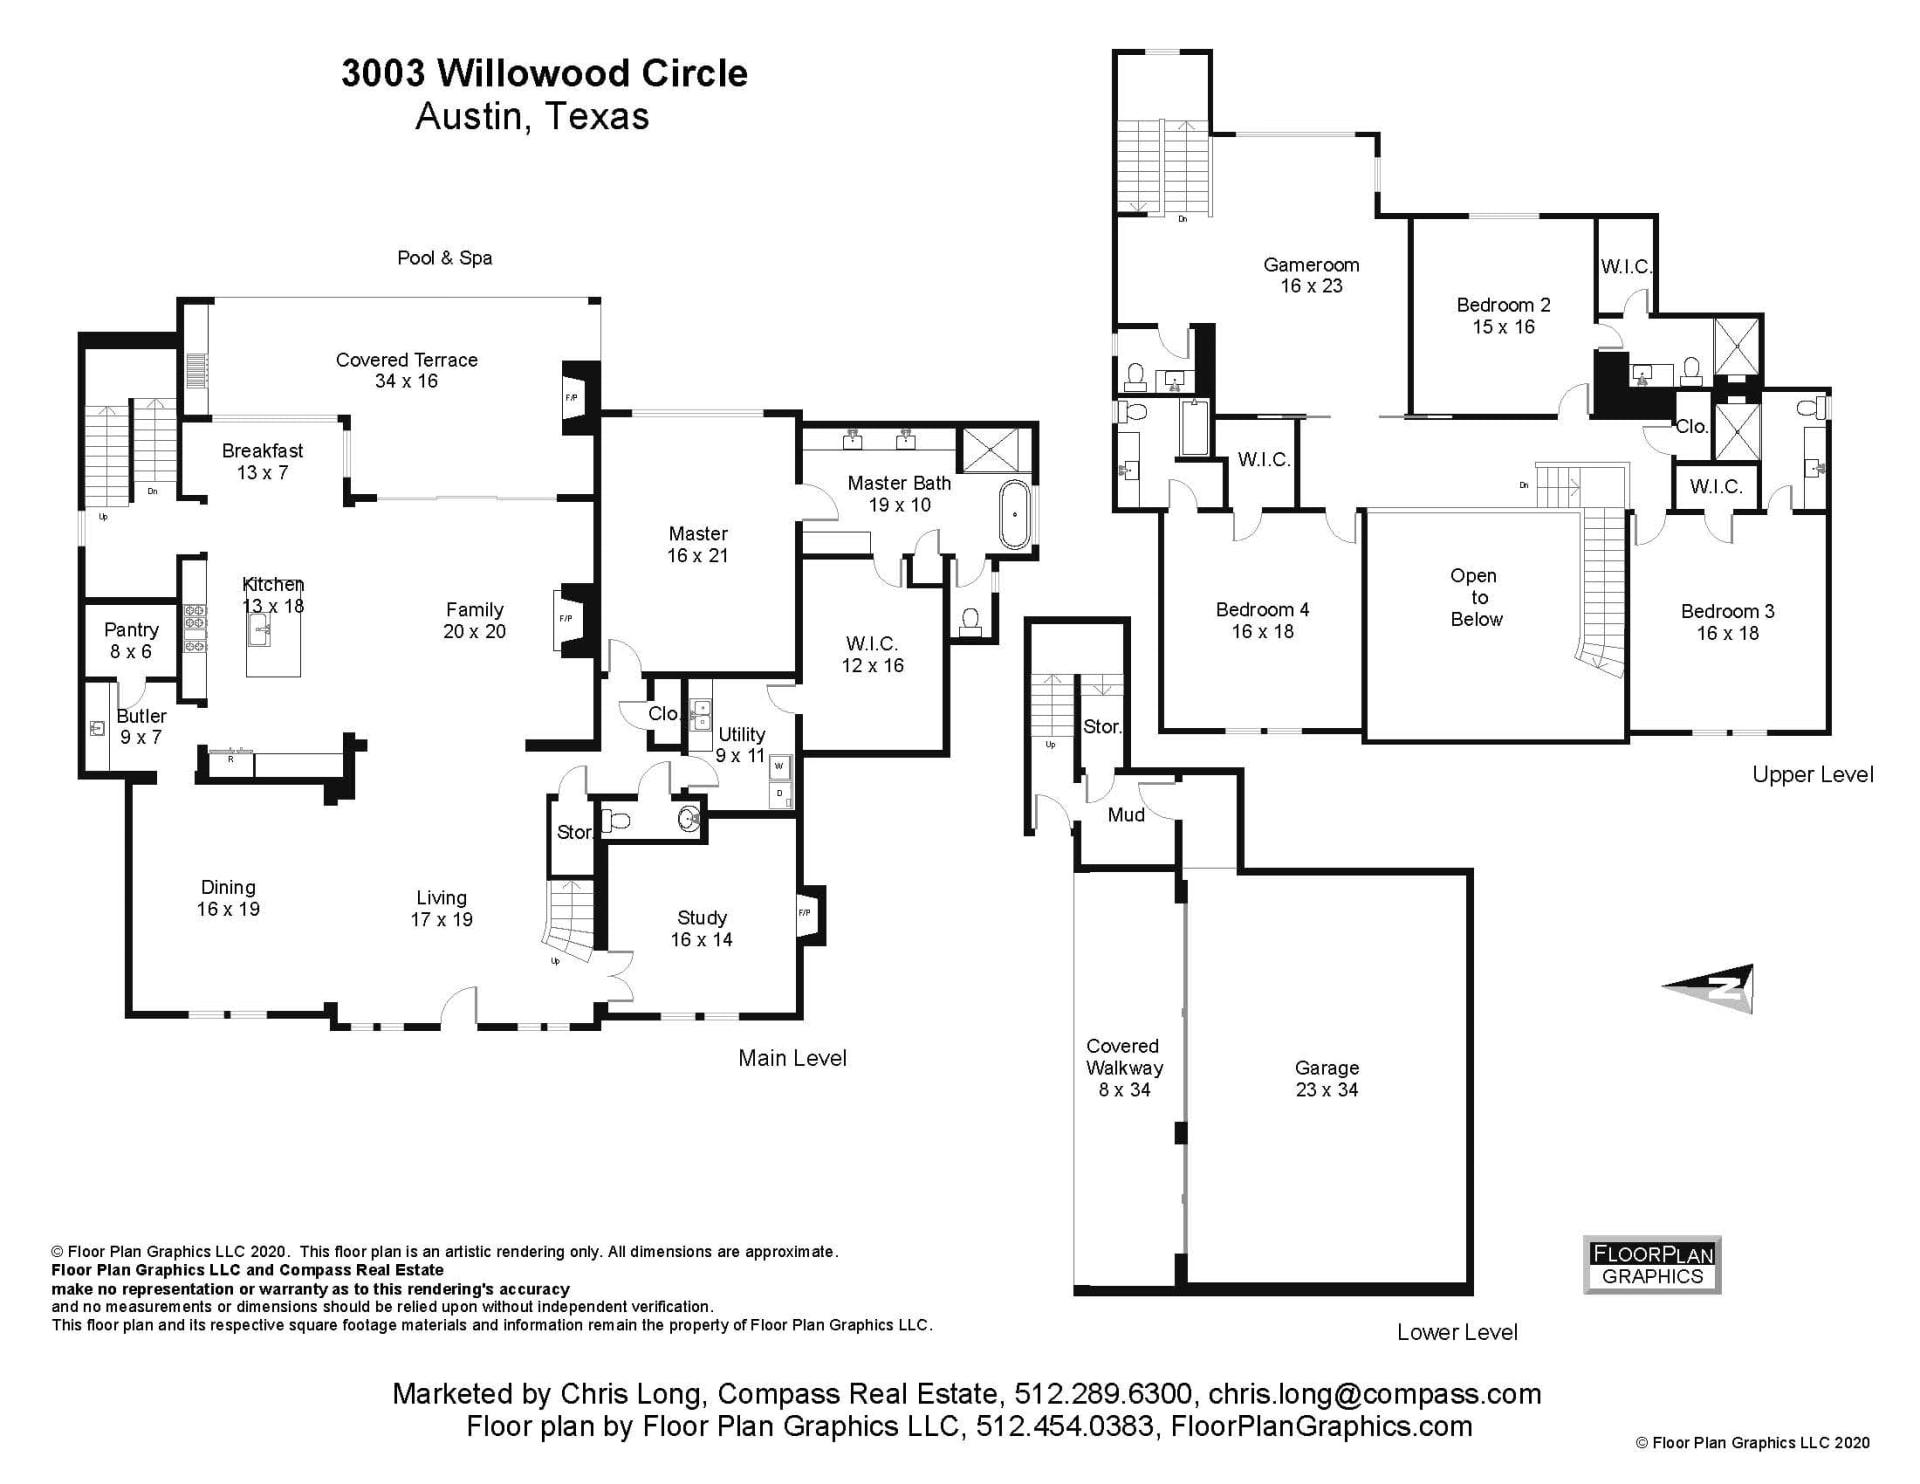 3003 Willowood Circle photo